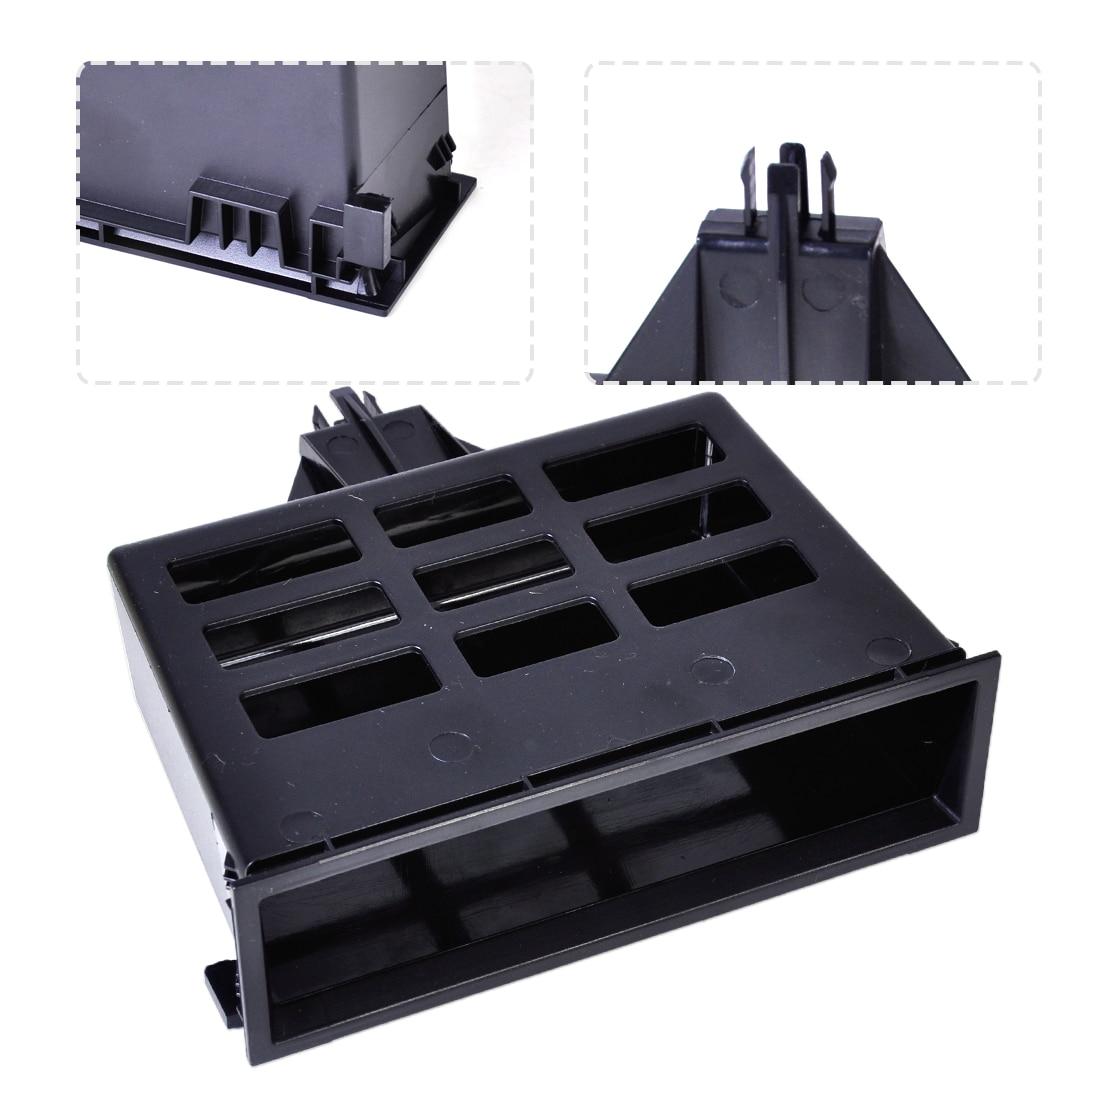 Black Dashboard Center Storage Tray Cubby Box 3B0857058 1J0857058A Fit for VW Jetta Golf MK4 Bora